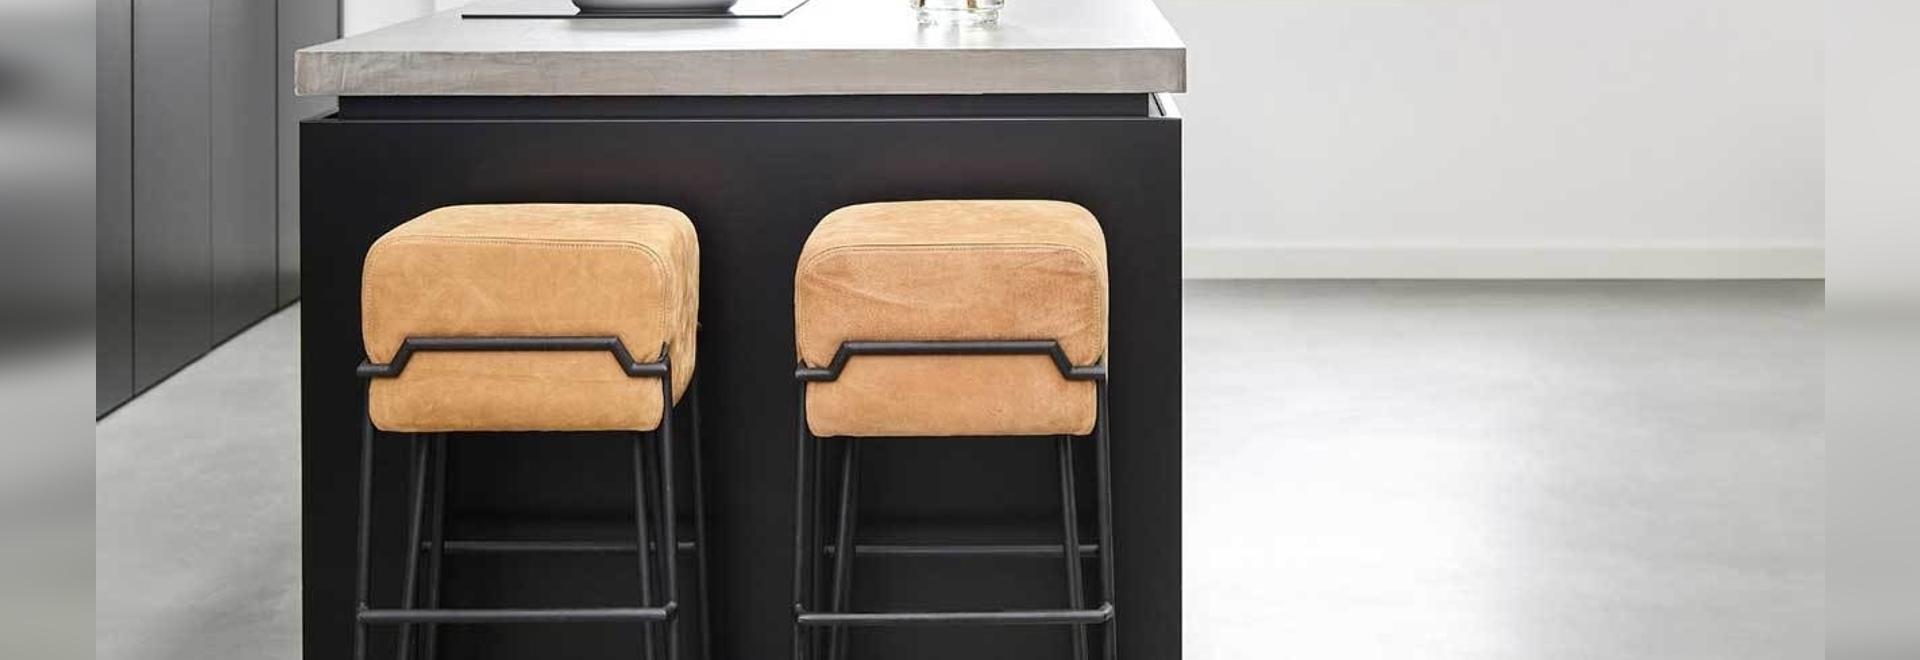 6 modernos taburetes de bar que alejarán a tu familia del televisor para cenar